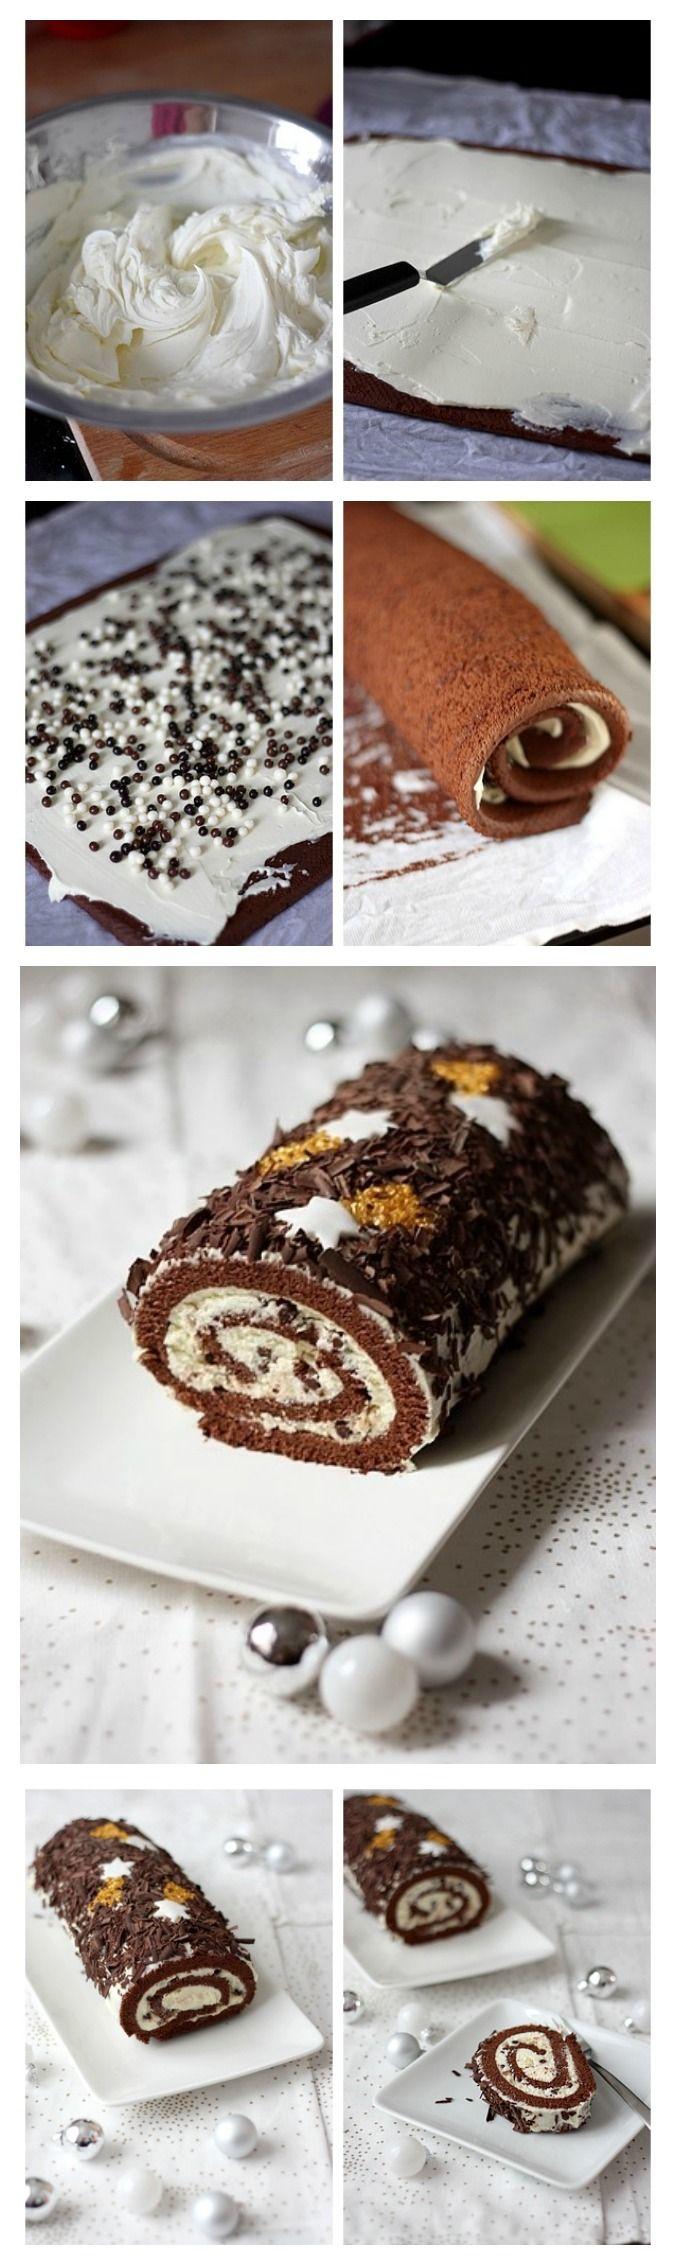 tronco-navidad-chocolate-pecados-reposteria-1 Recipe translates to English.